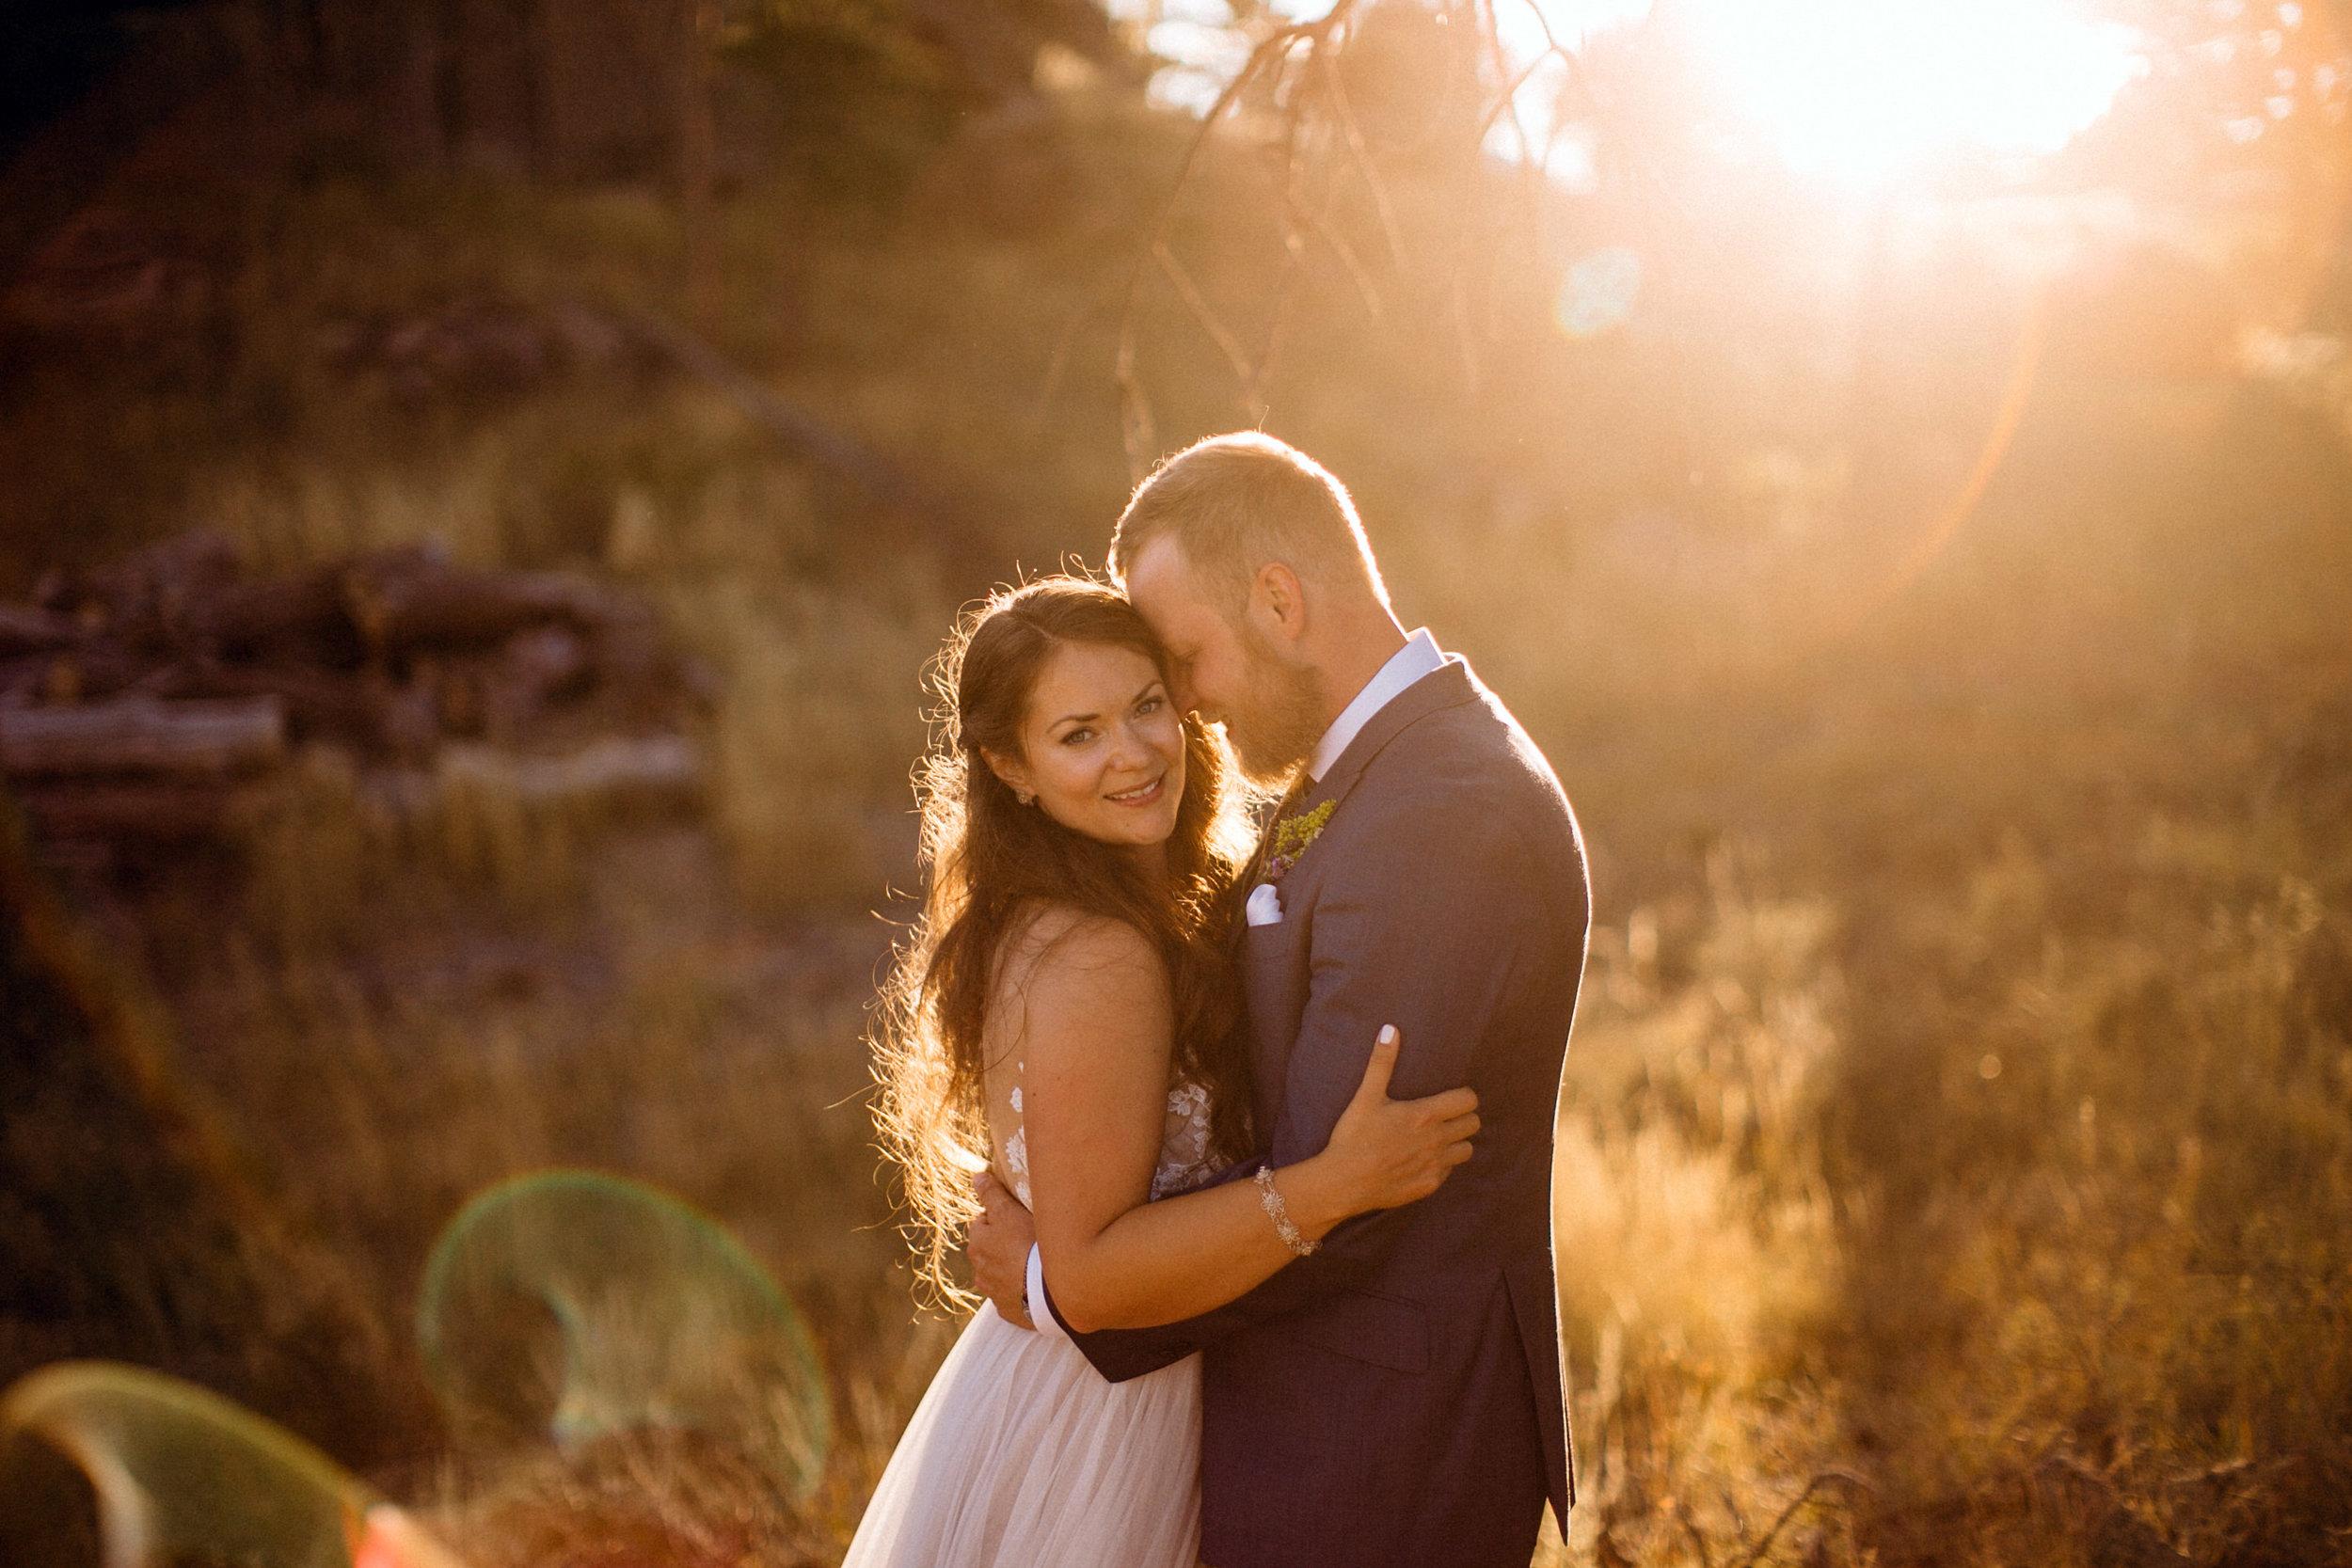 Liz Osban Photography Vedauwoo Buford Wyoming Happy Jack Wedding Elopement Destination Small Forest Cheyenne Laramie Medicine Bow National Forest Portraits Sarah Taylor27.jpg